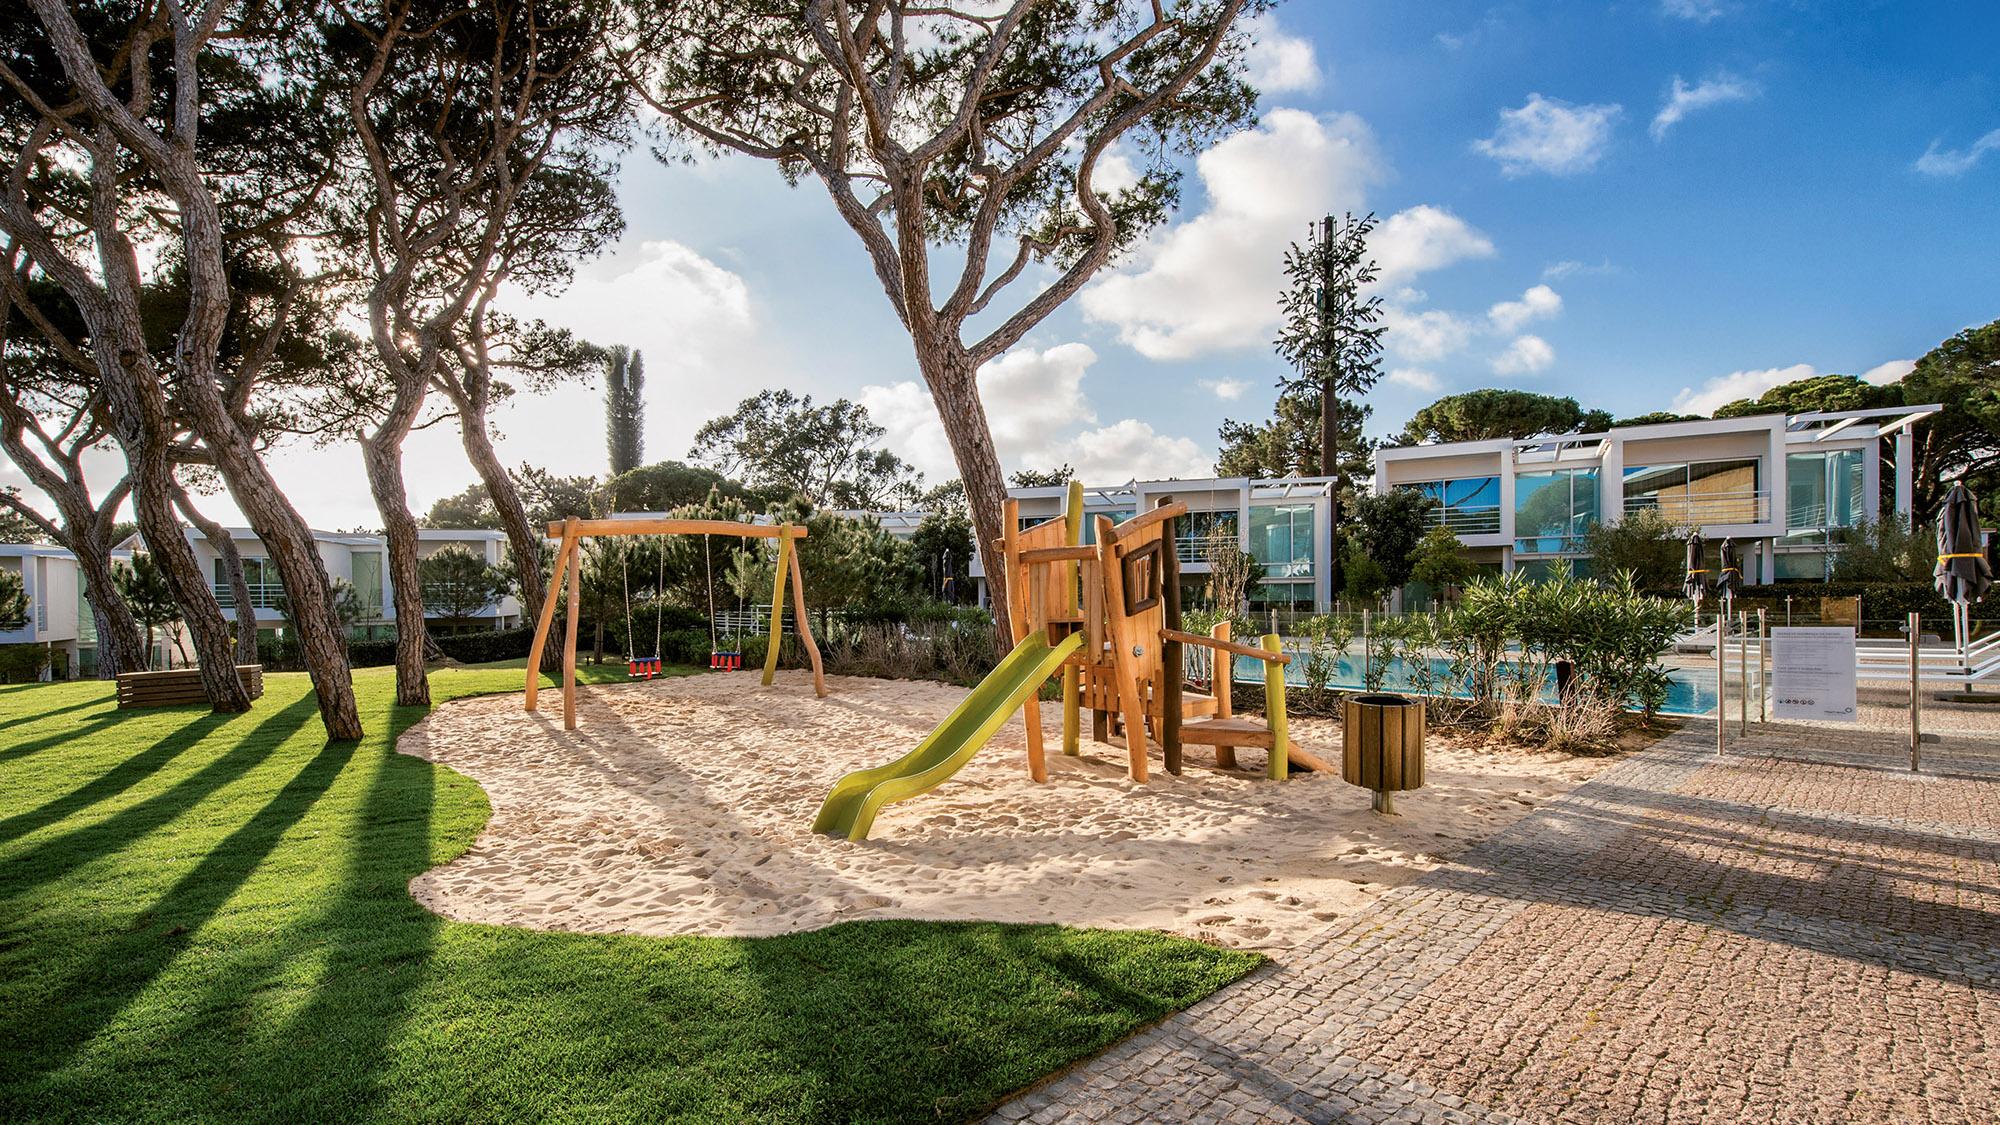 martinhal parental peace of mind in portugal travel weekly. Black Bedroom Furniture Sets. Home Design Ideas